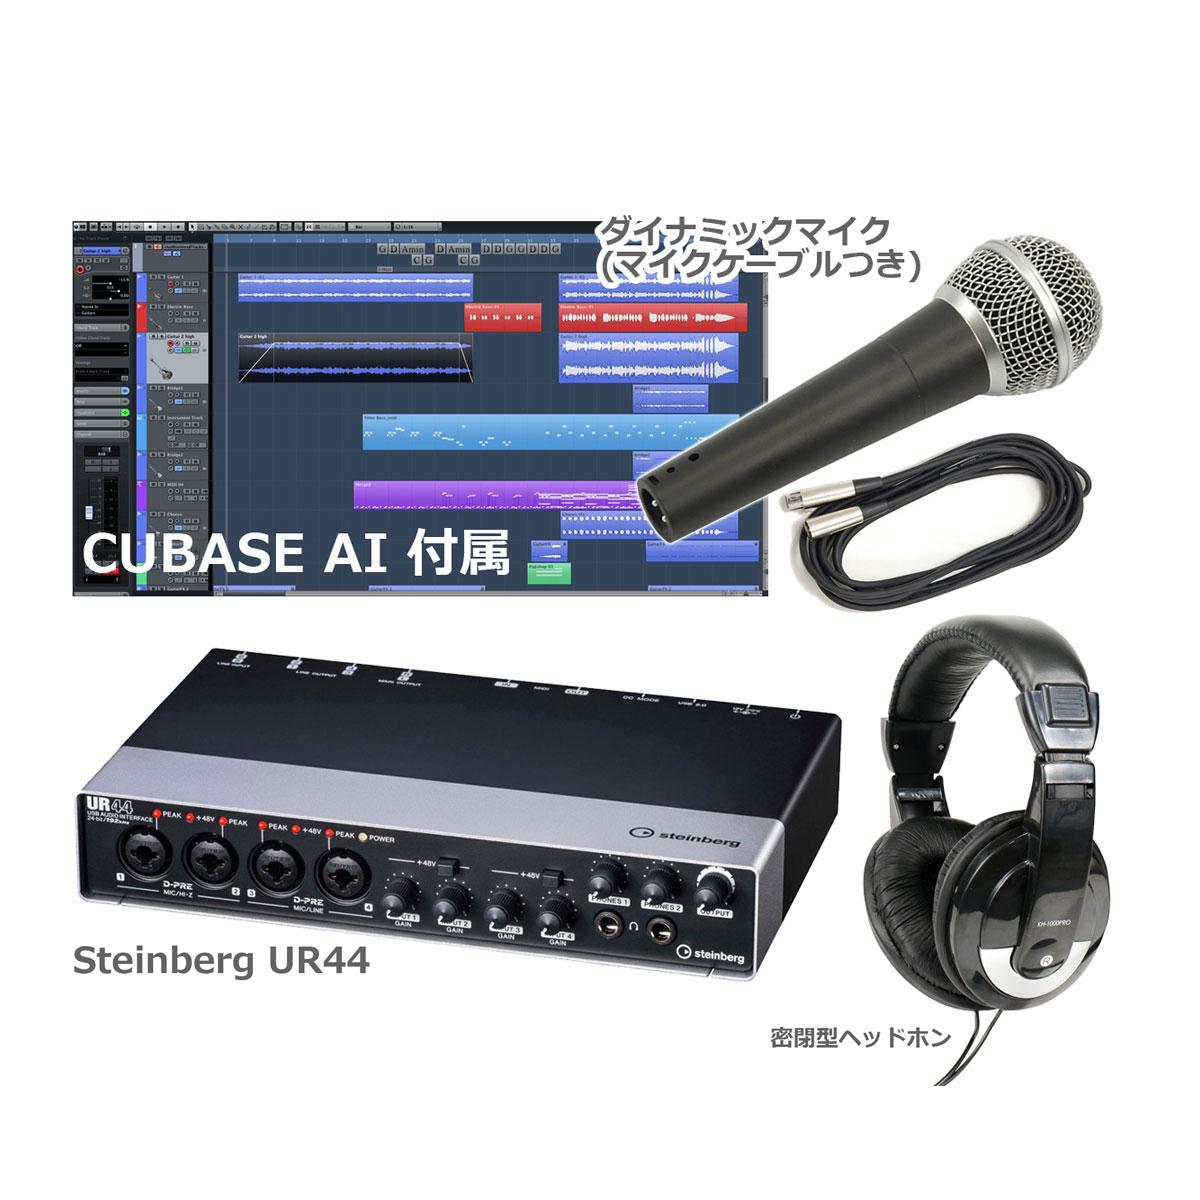 Steinberg スタインバーグ / UR44 オーディオインターフェース 【スタートセット!】